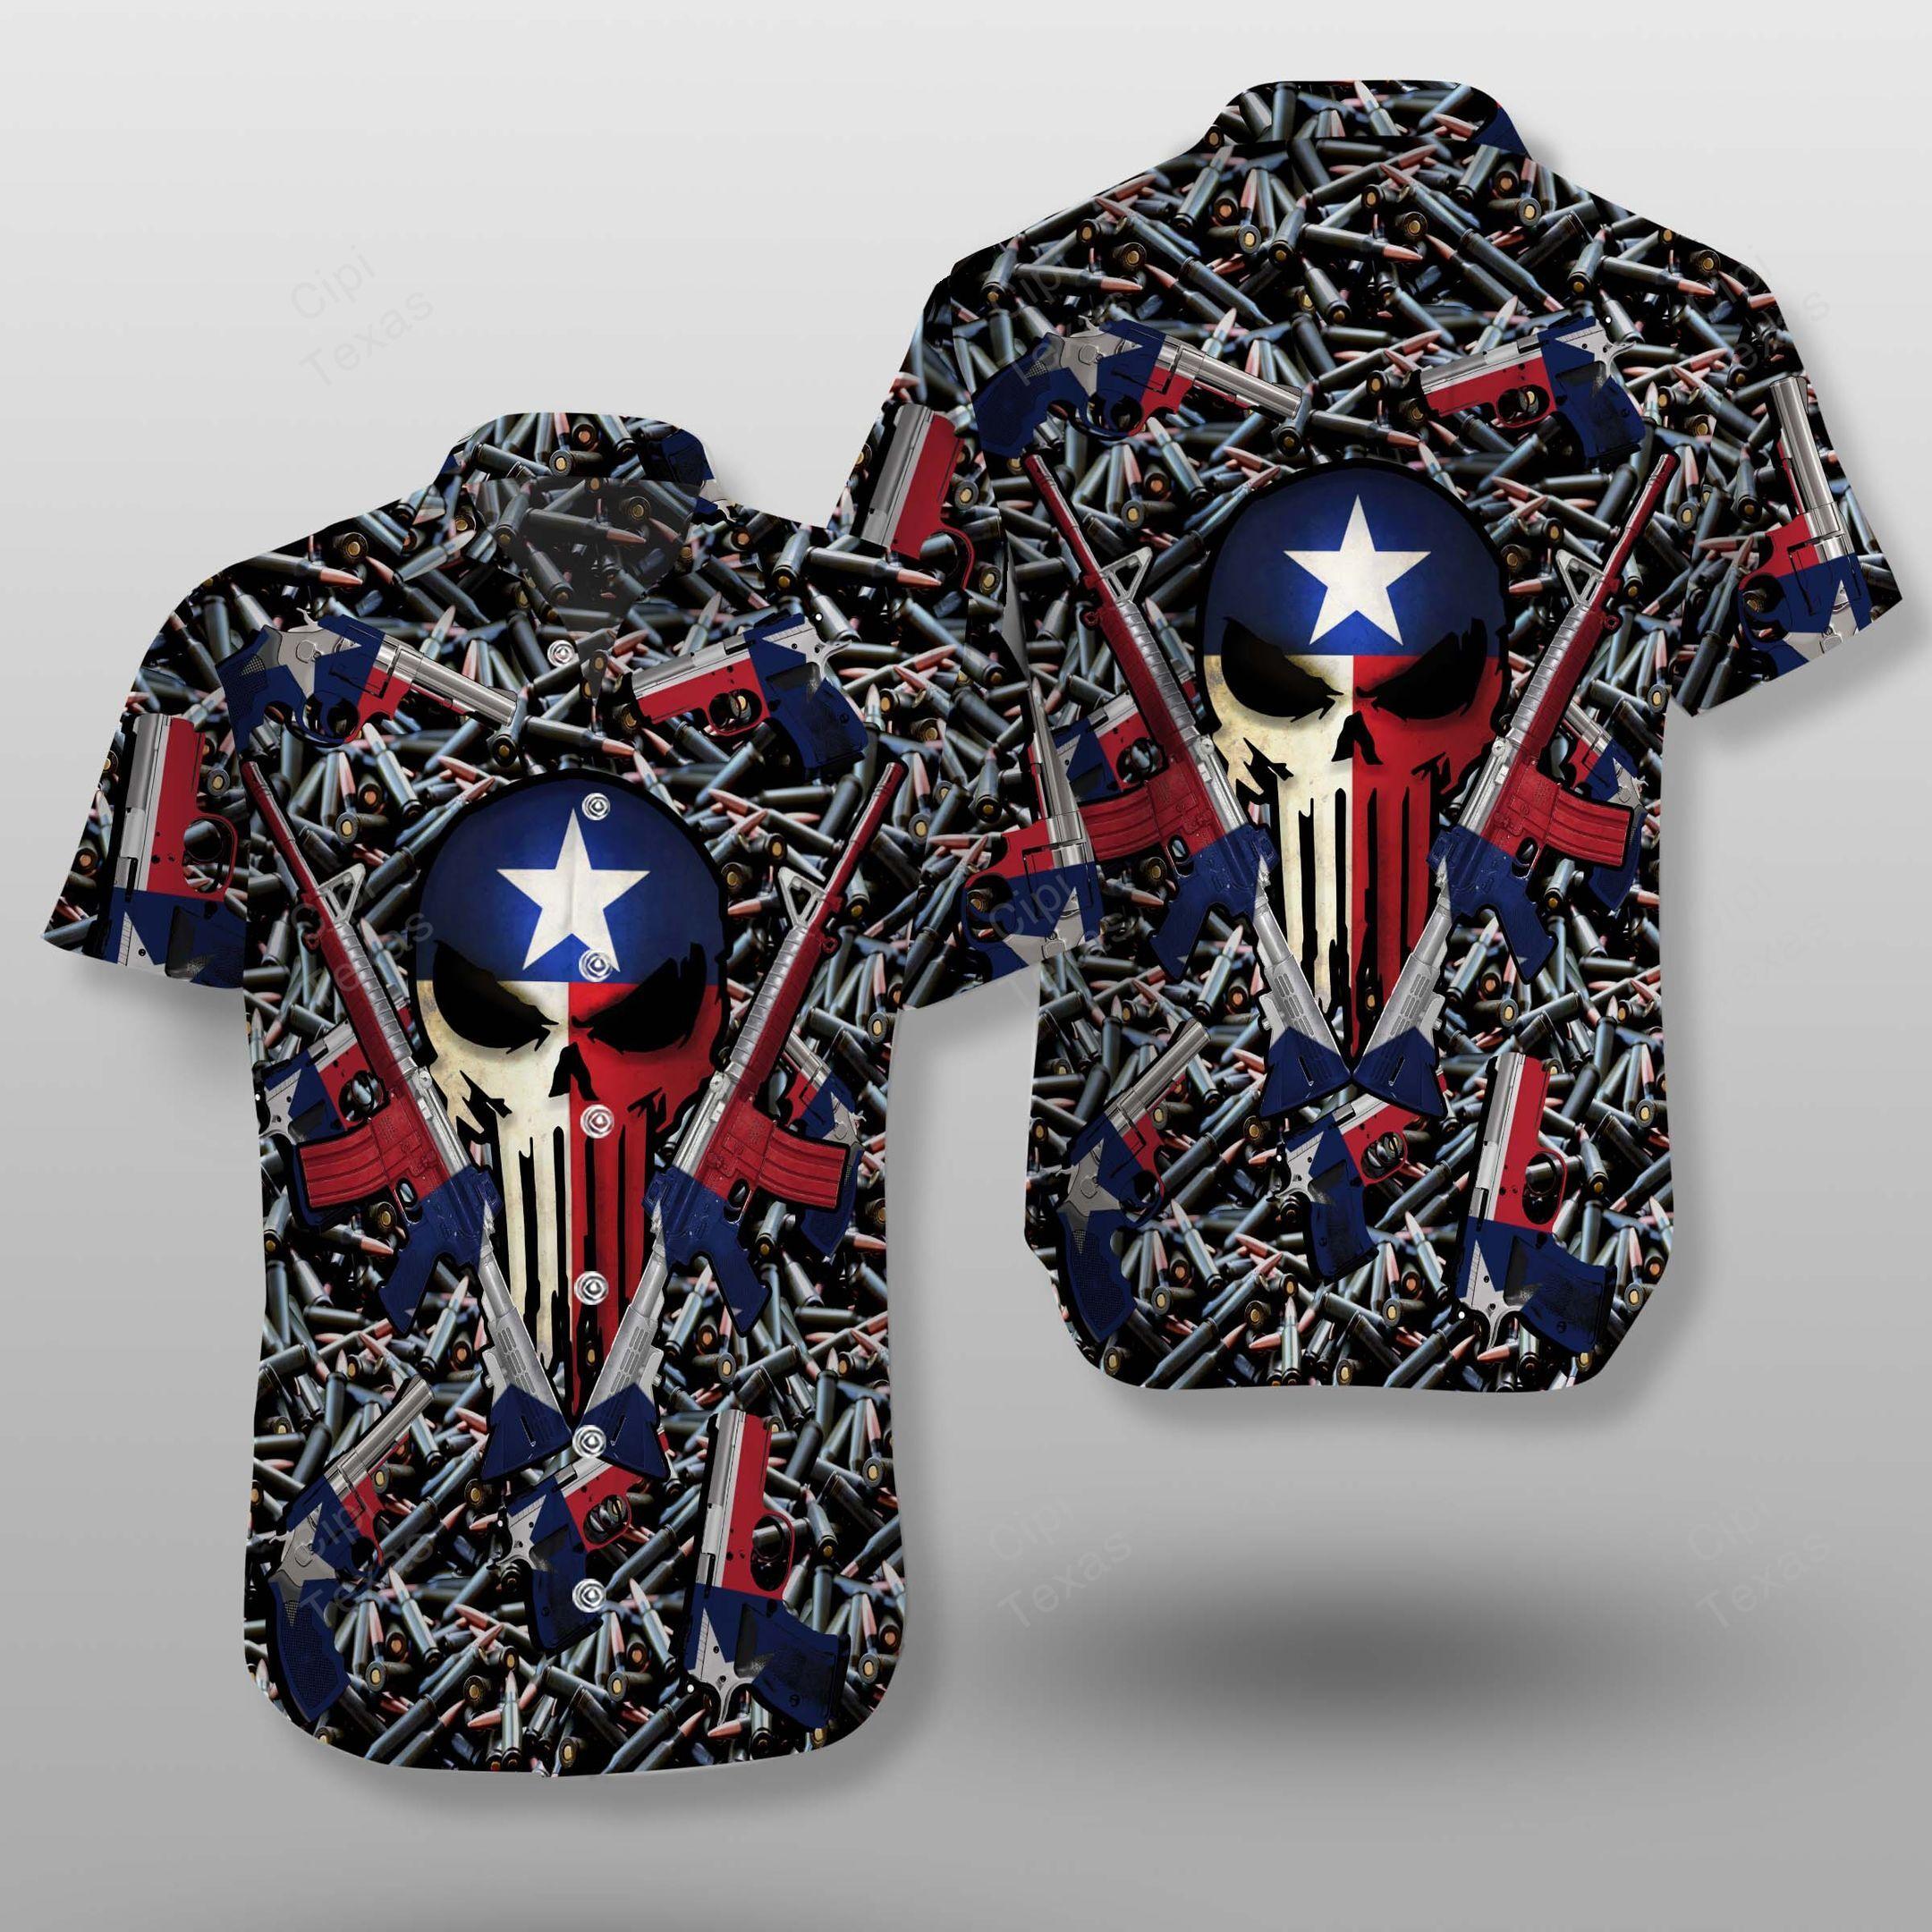 Skull Texas Flag Guns and Bullets Hawaiian Shirt